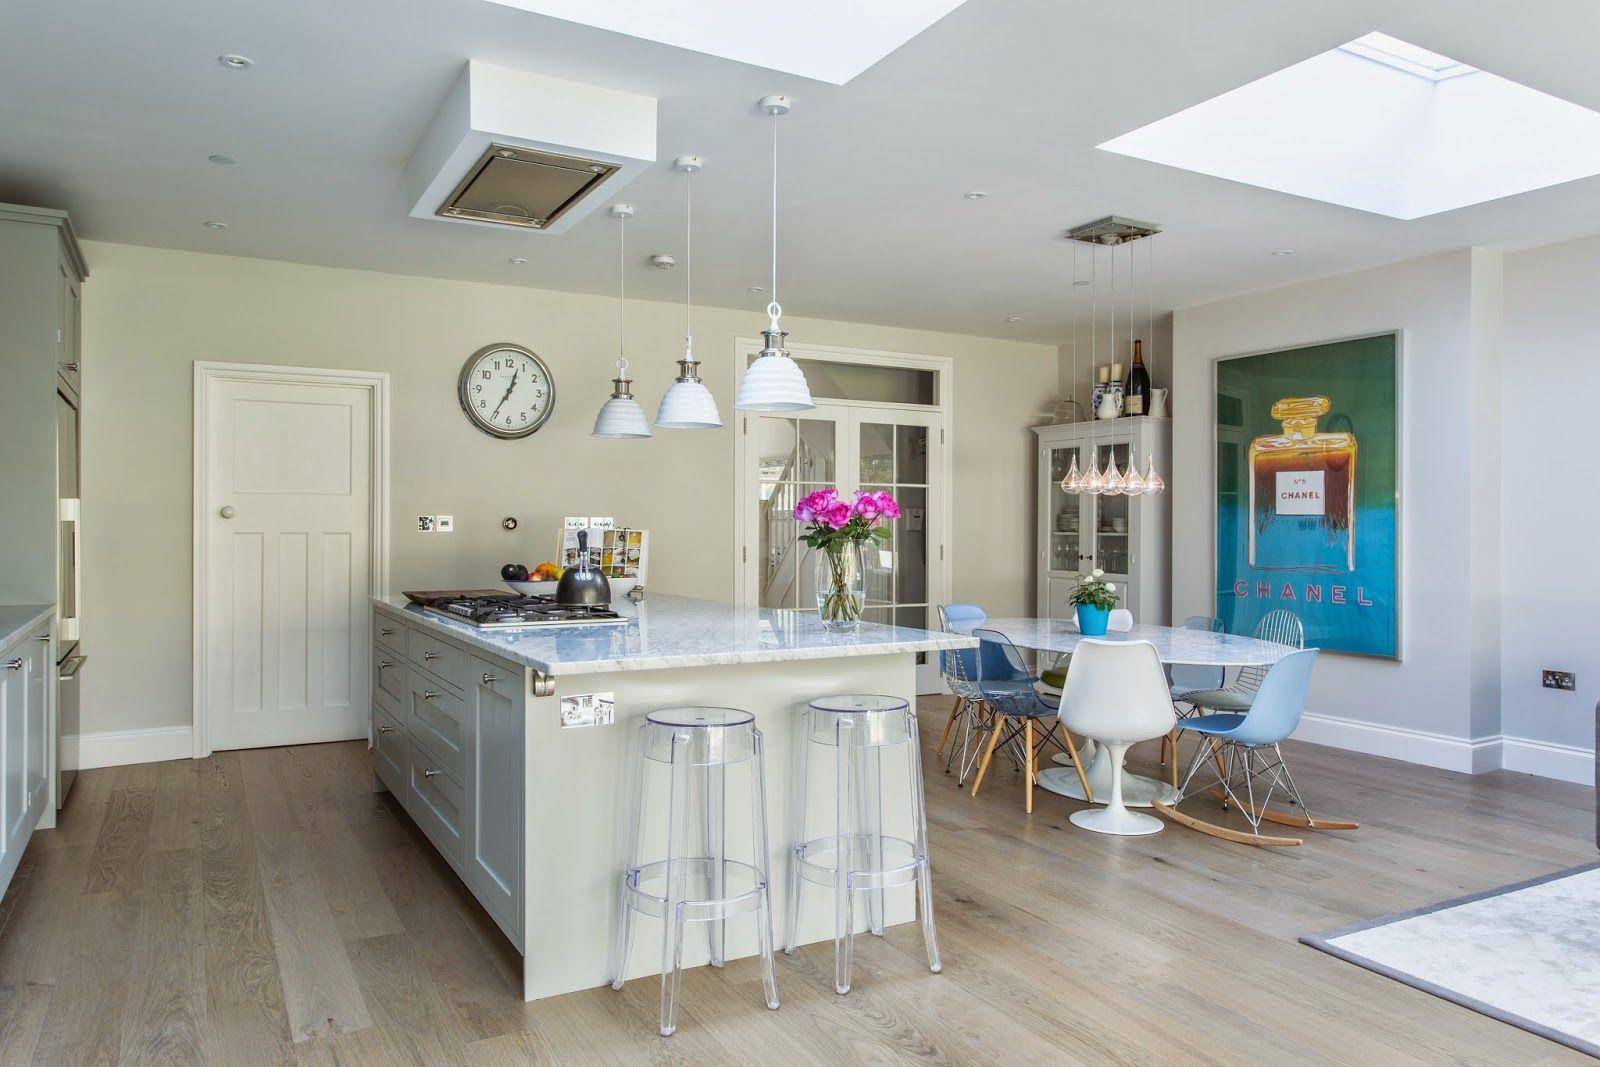 Merveilleux Kitchen Design, South West London Home